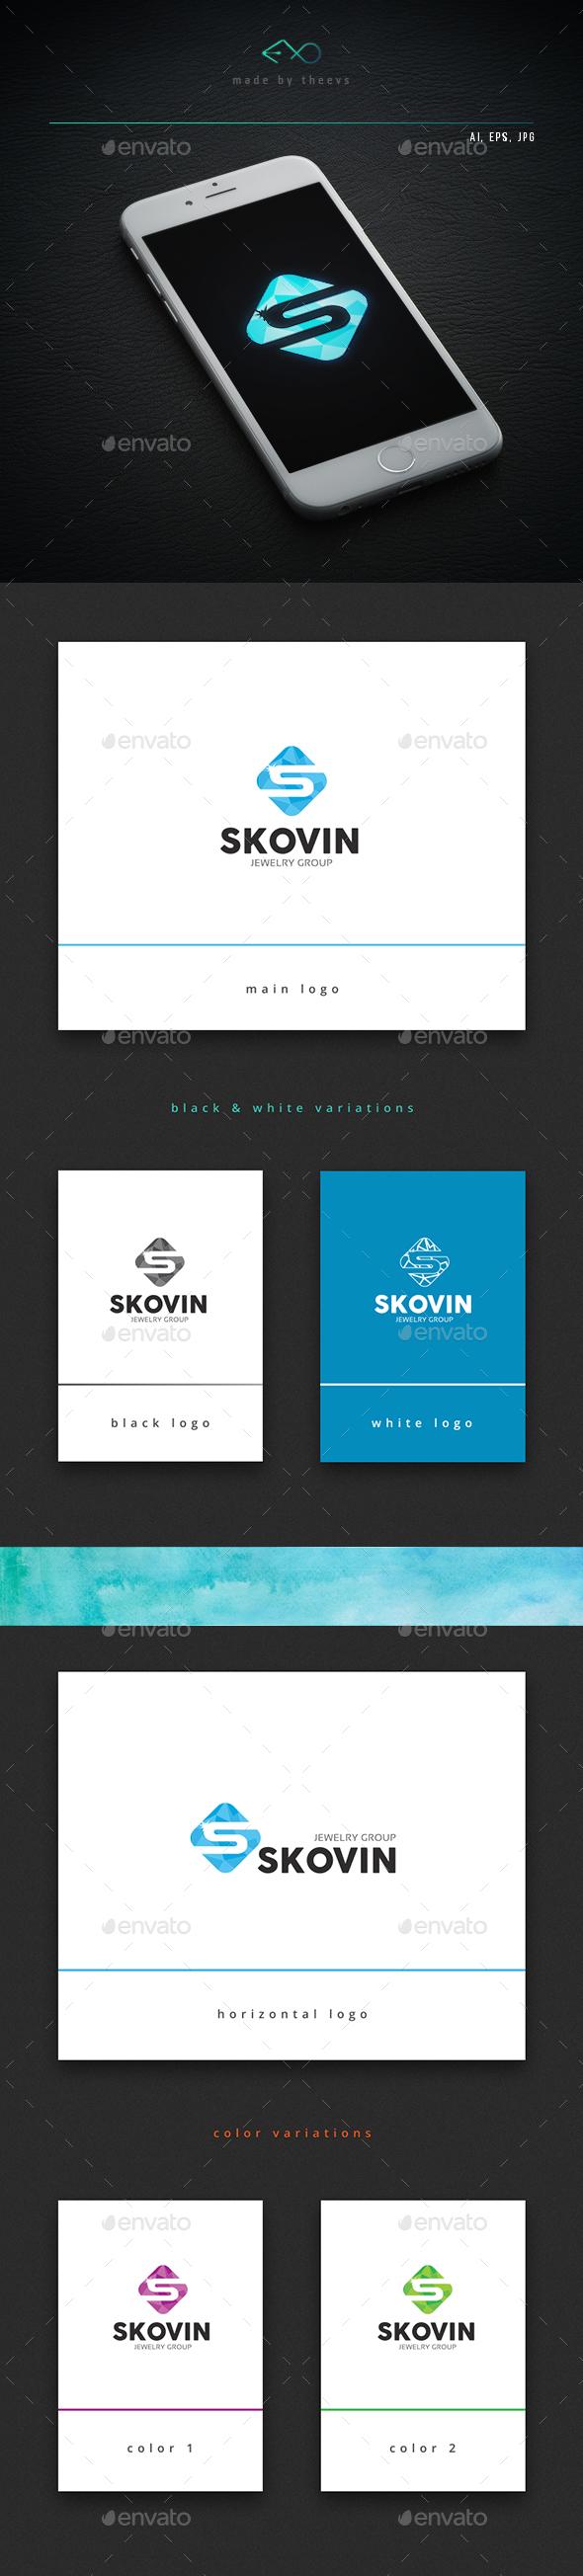 Skovin - Letters Logo Templates